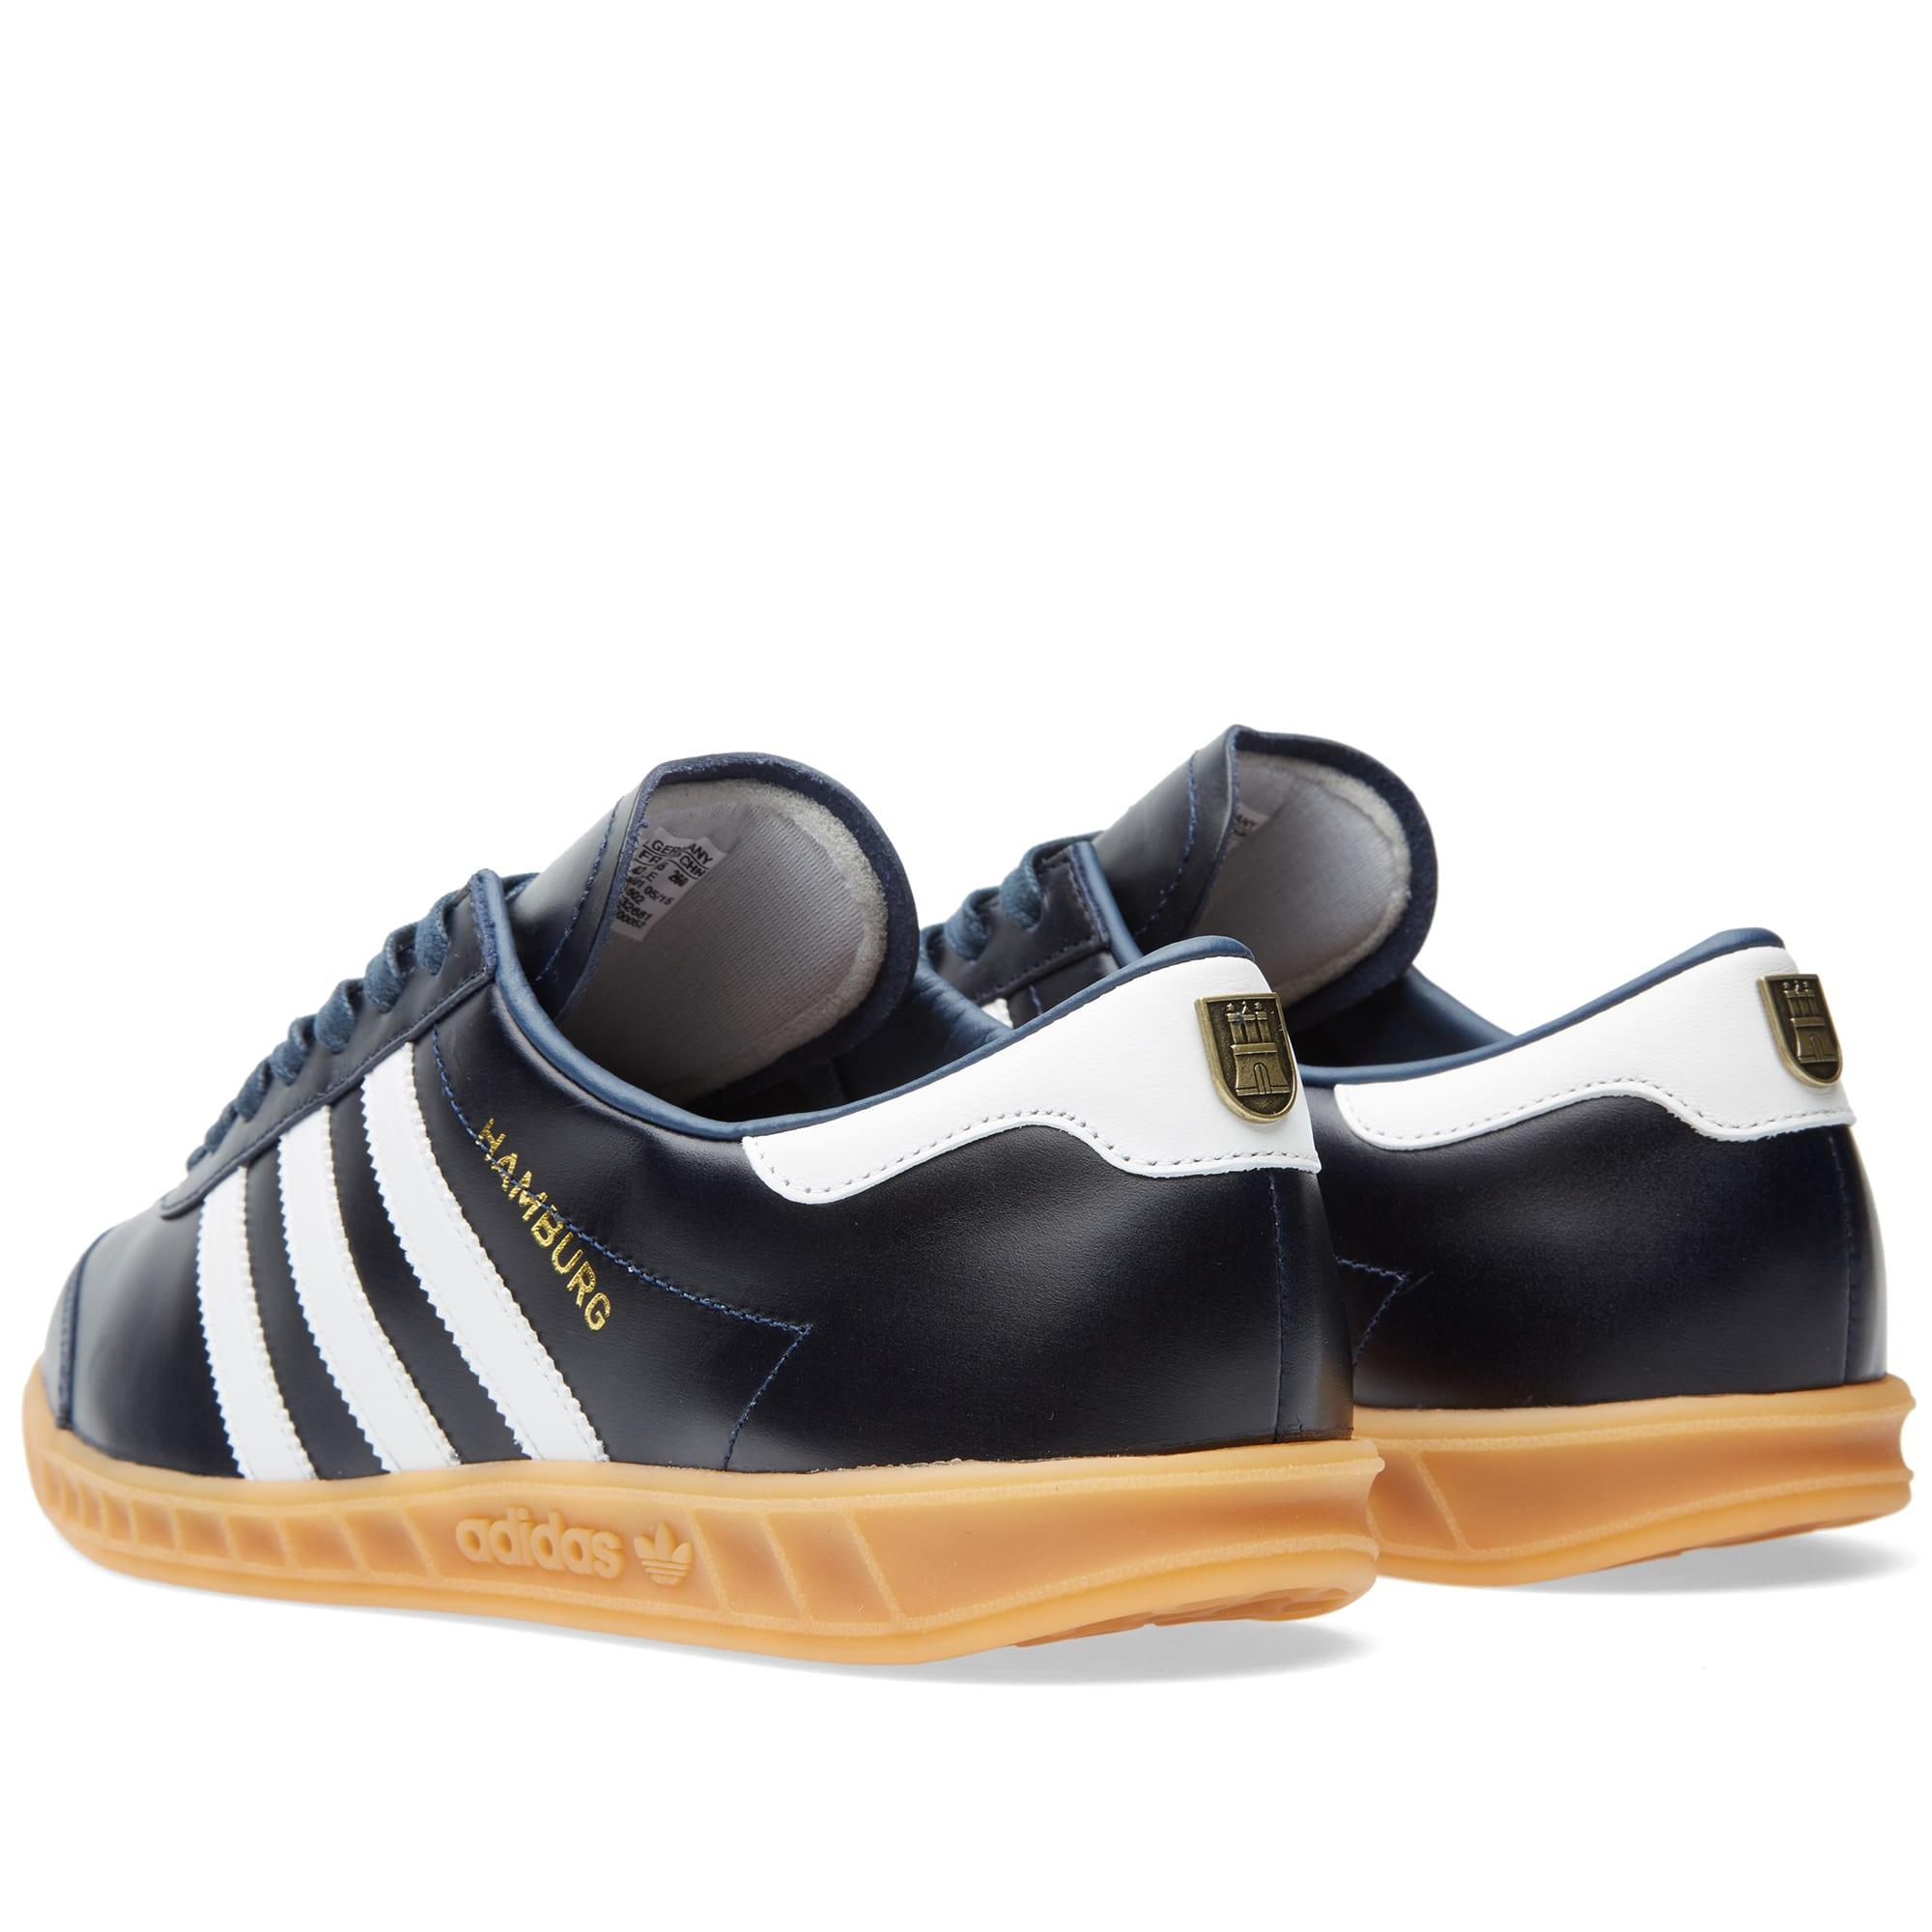 Adidas Hamburg - Made in Germany